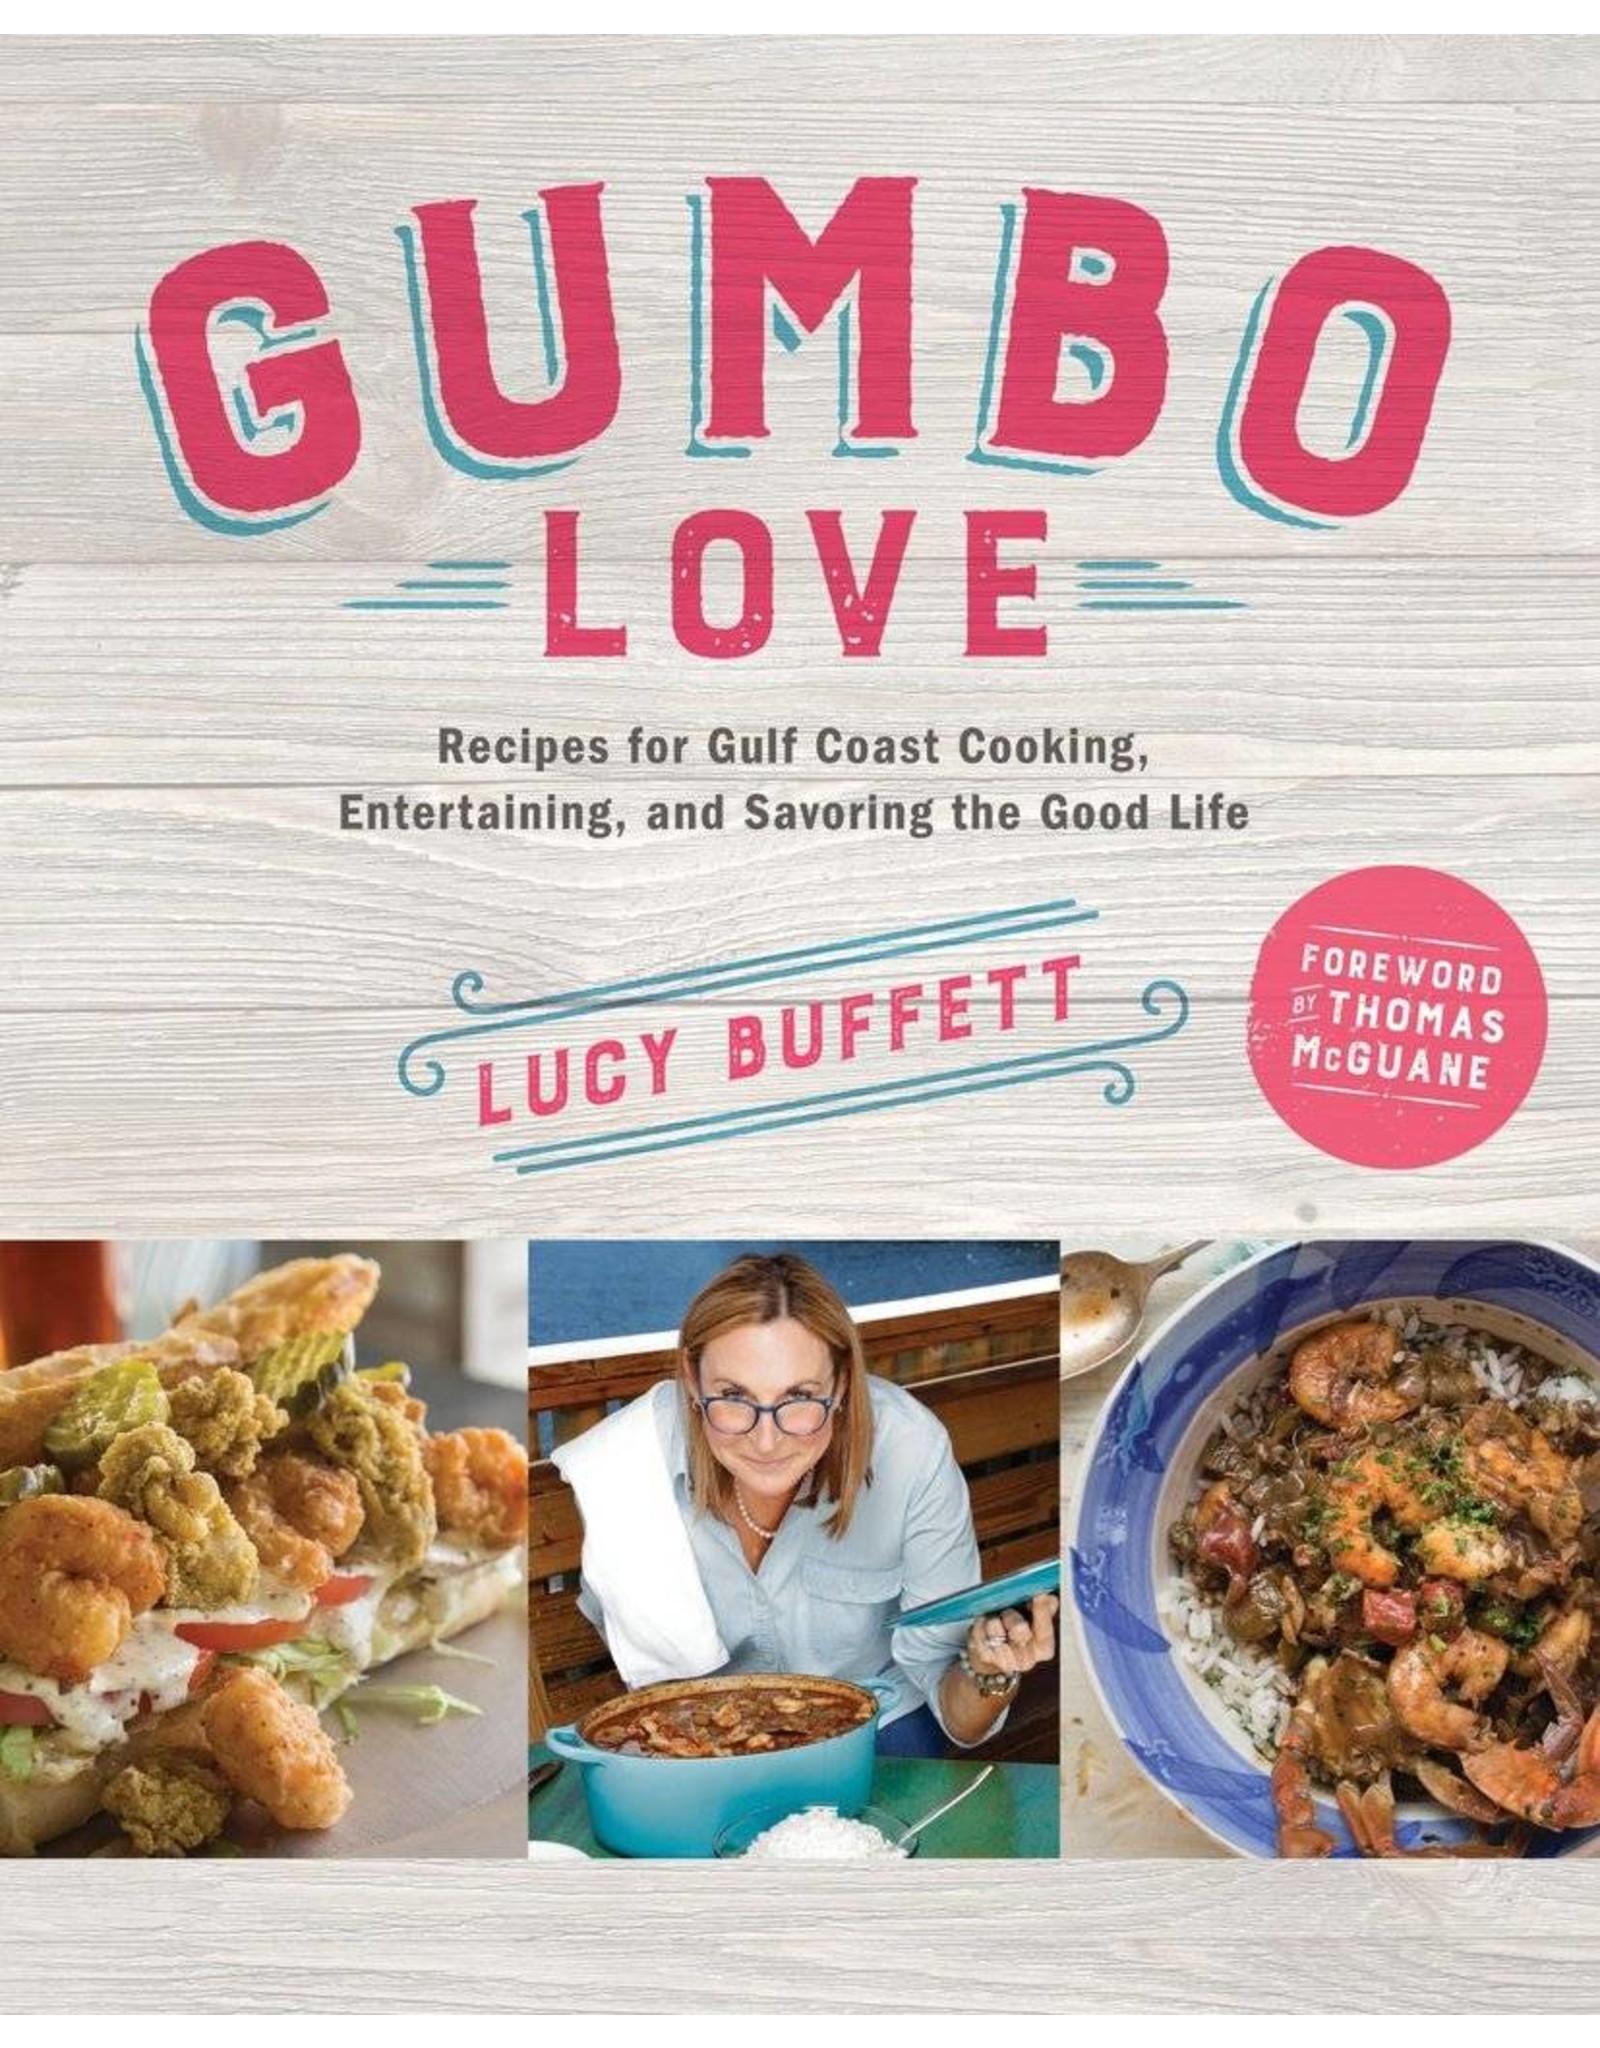 Gumbo Love Cookbook